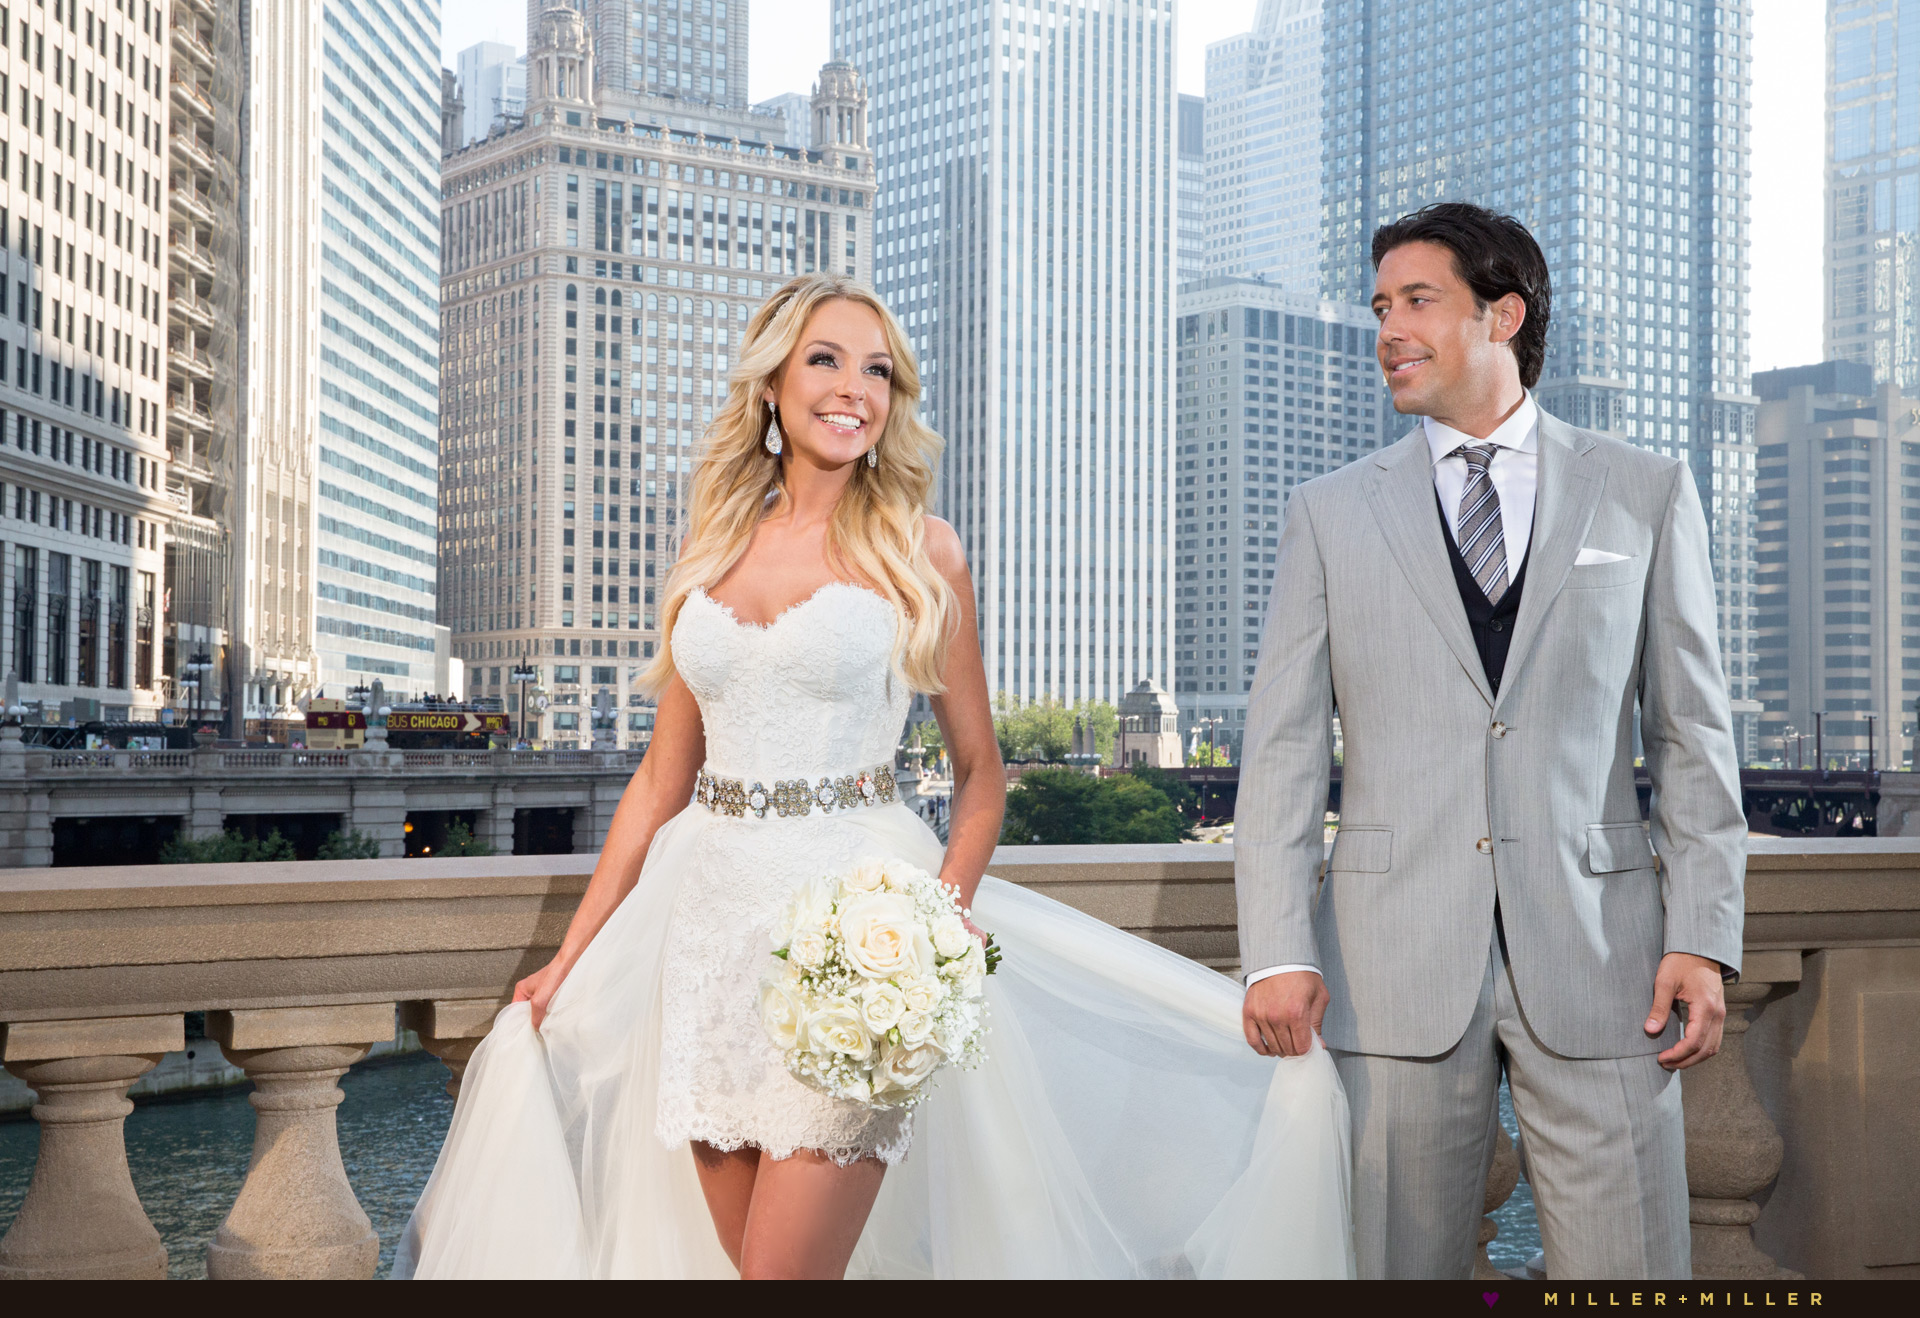 Natalie Ed Swiderski married wedding photographs